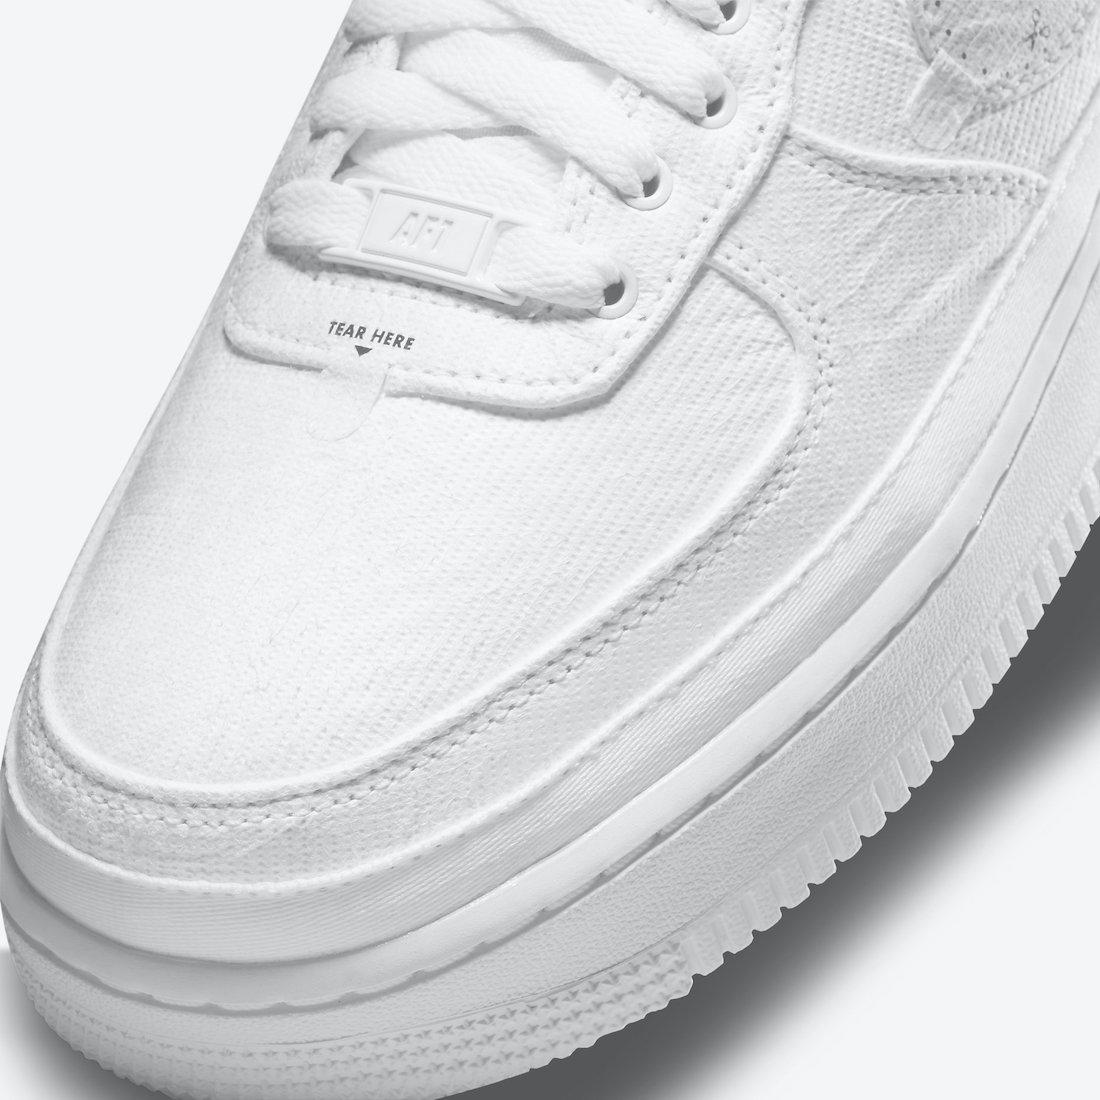 Nike Air Force 1 Low 'Tear Away Texture Reveal' DJ9941-244 7